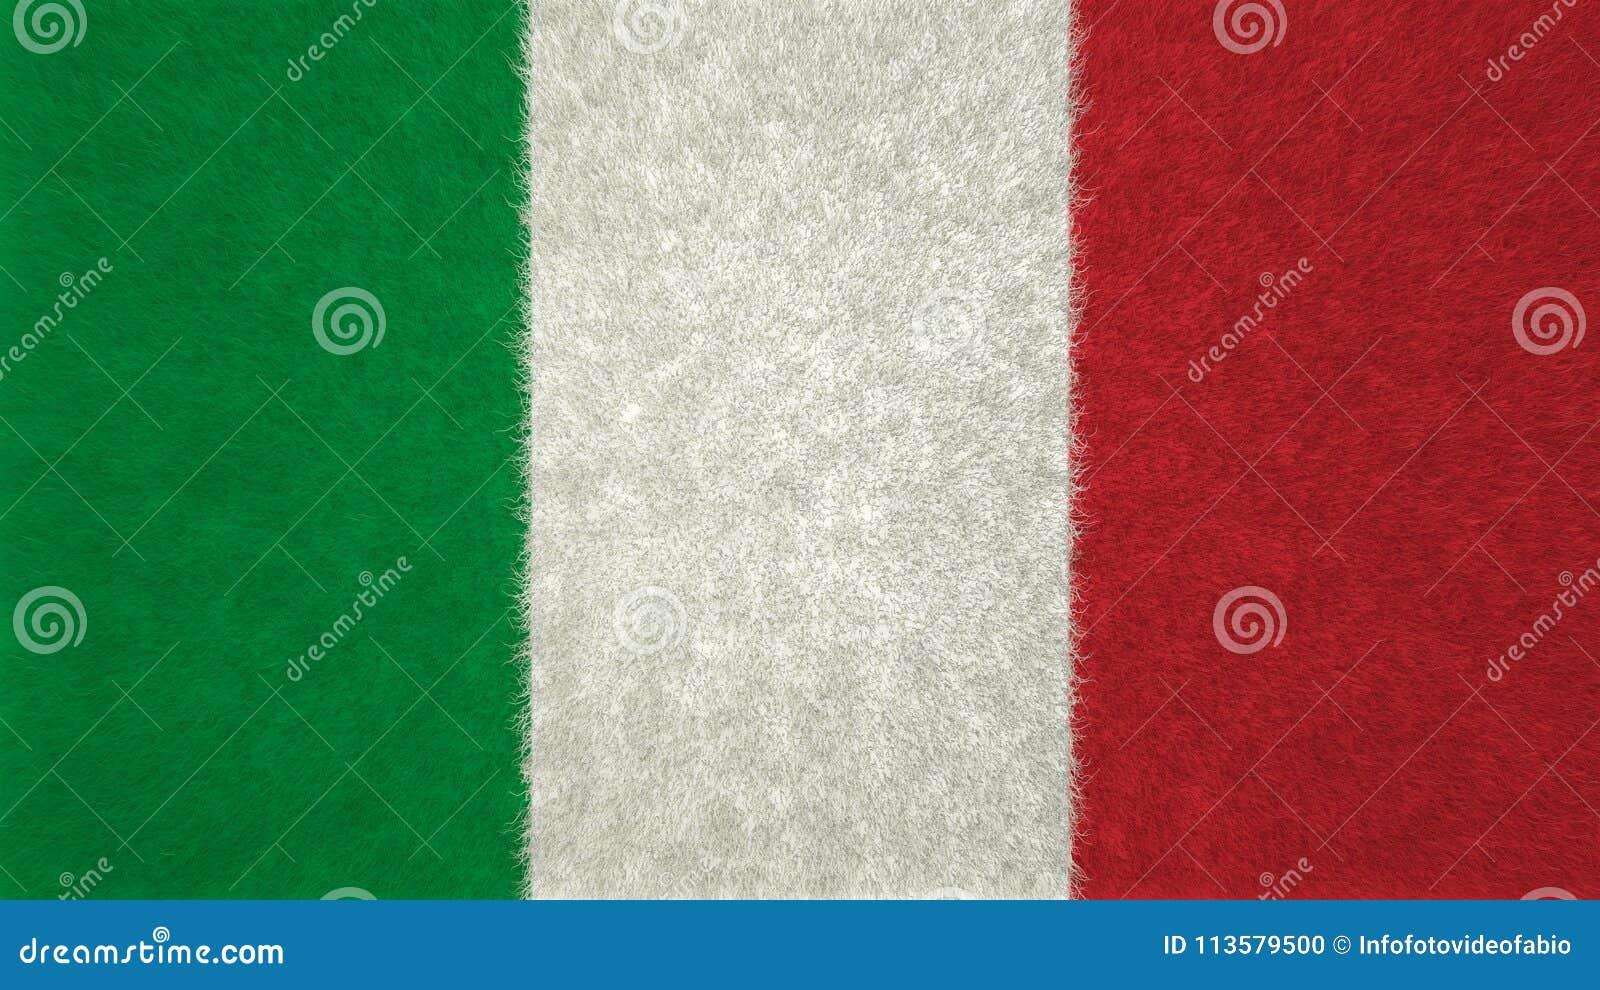 Italian Flag Green White And Red 3d Image Stock Illustration